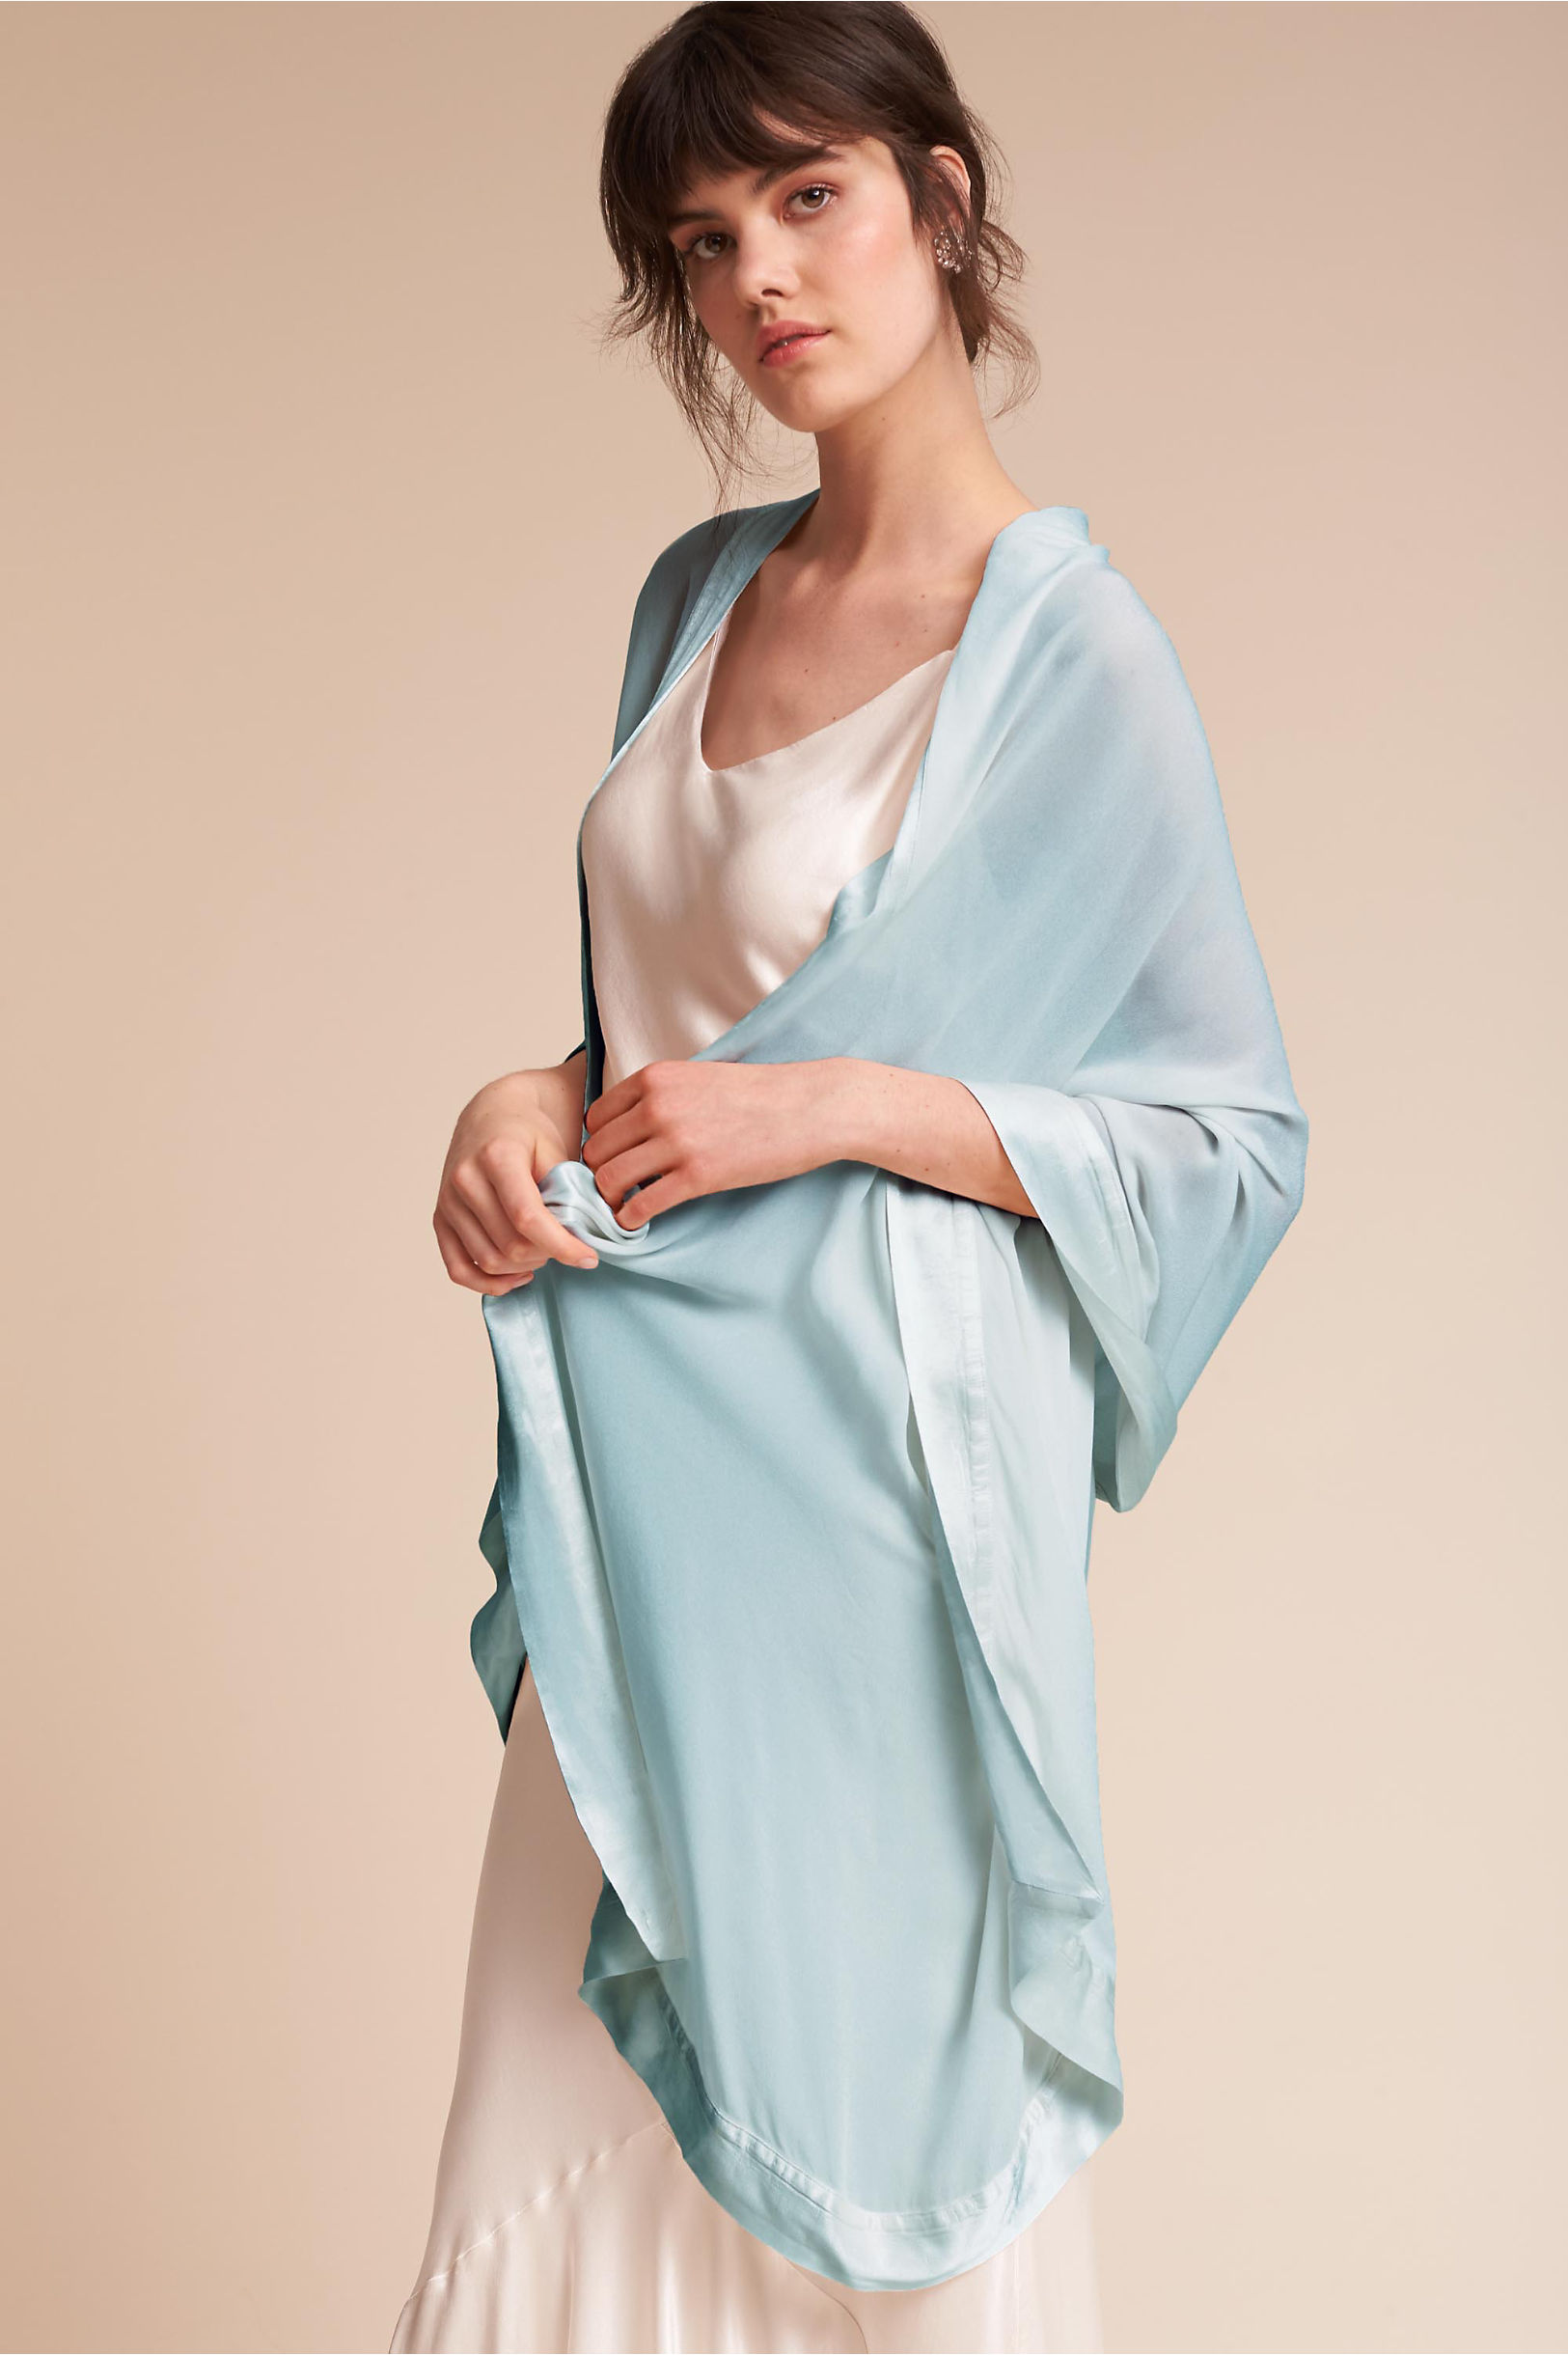 Zara Shawl Sky Light in Sale | BHLDN